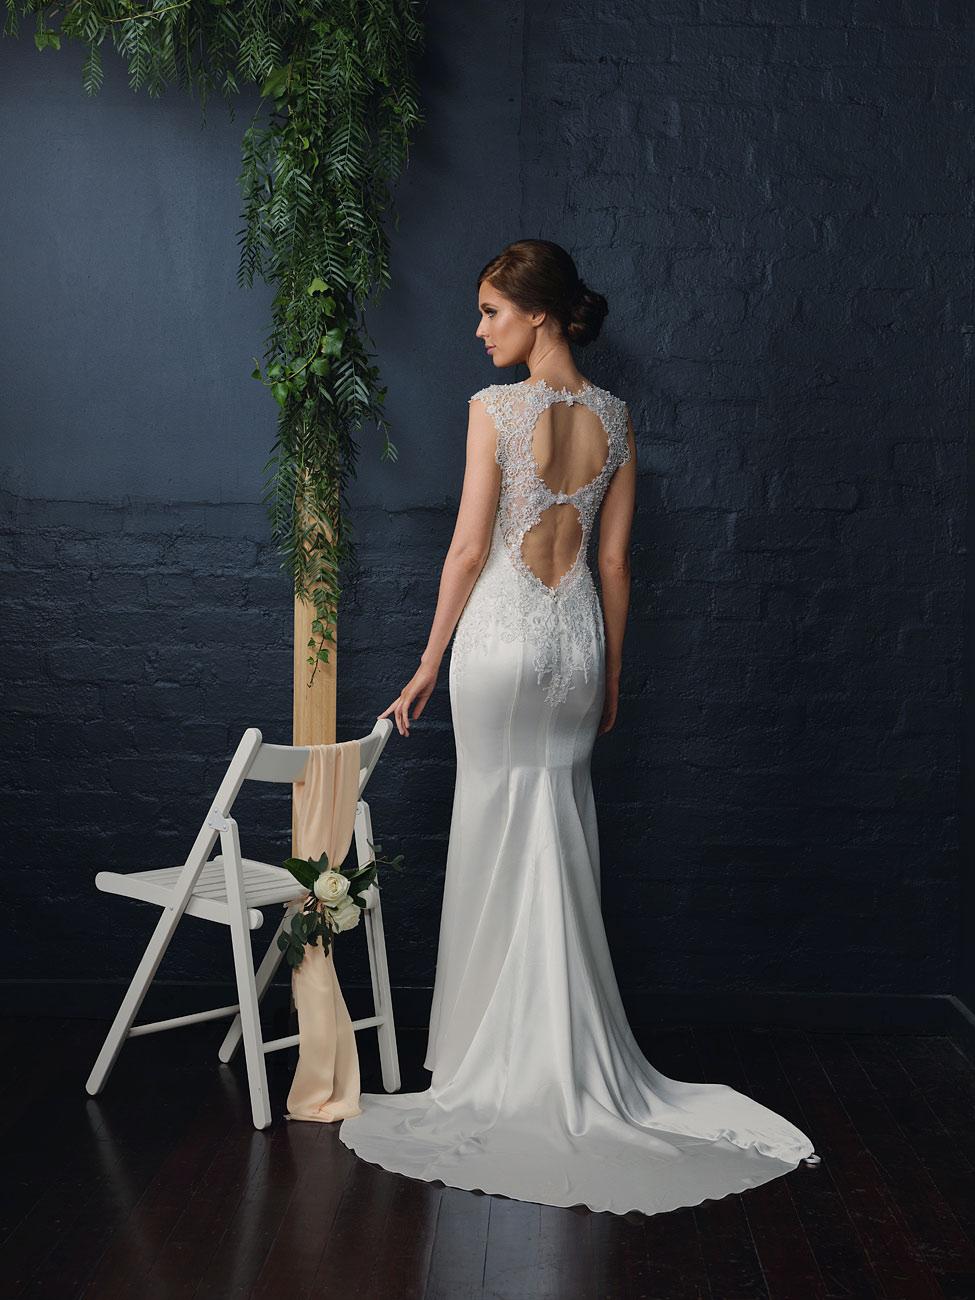 belleetblanc-wedding-photography-2.jpg